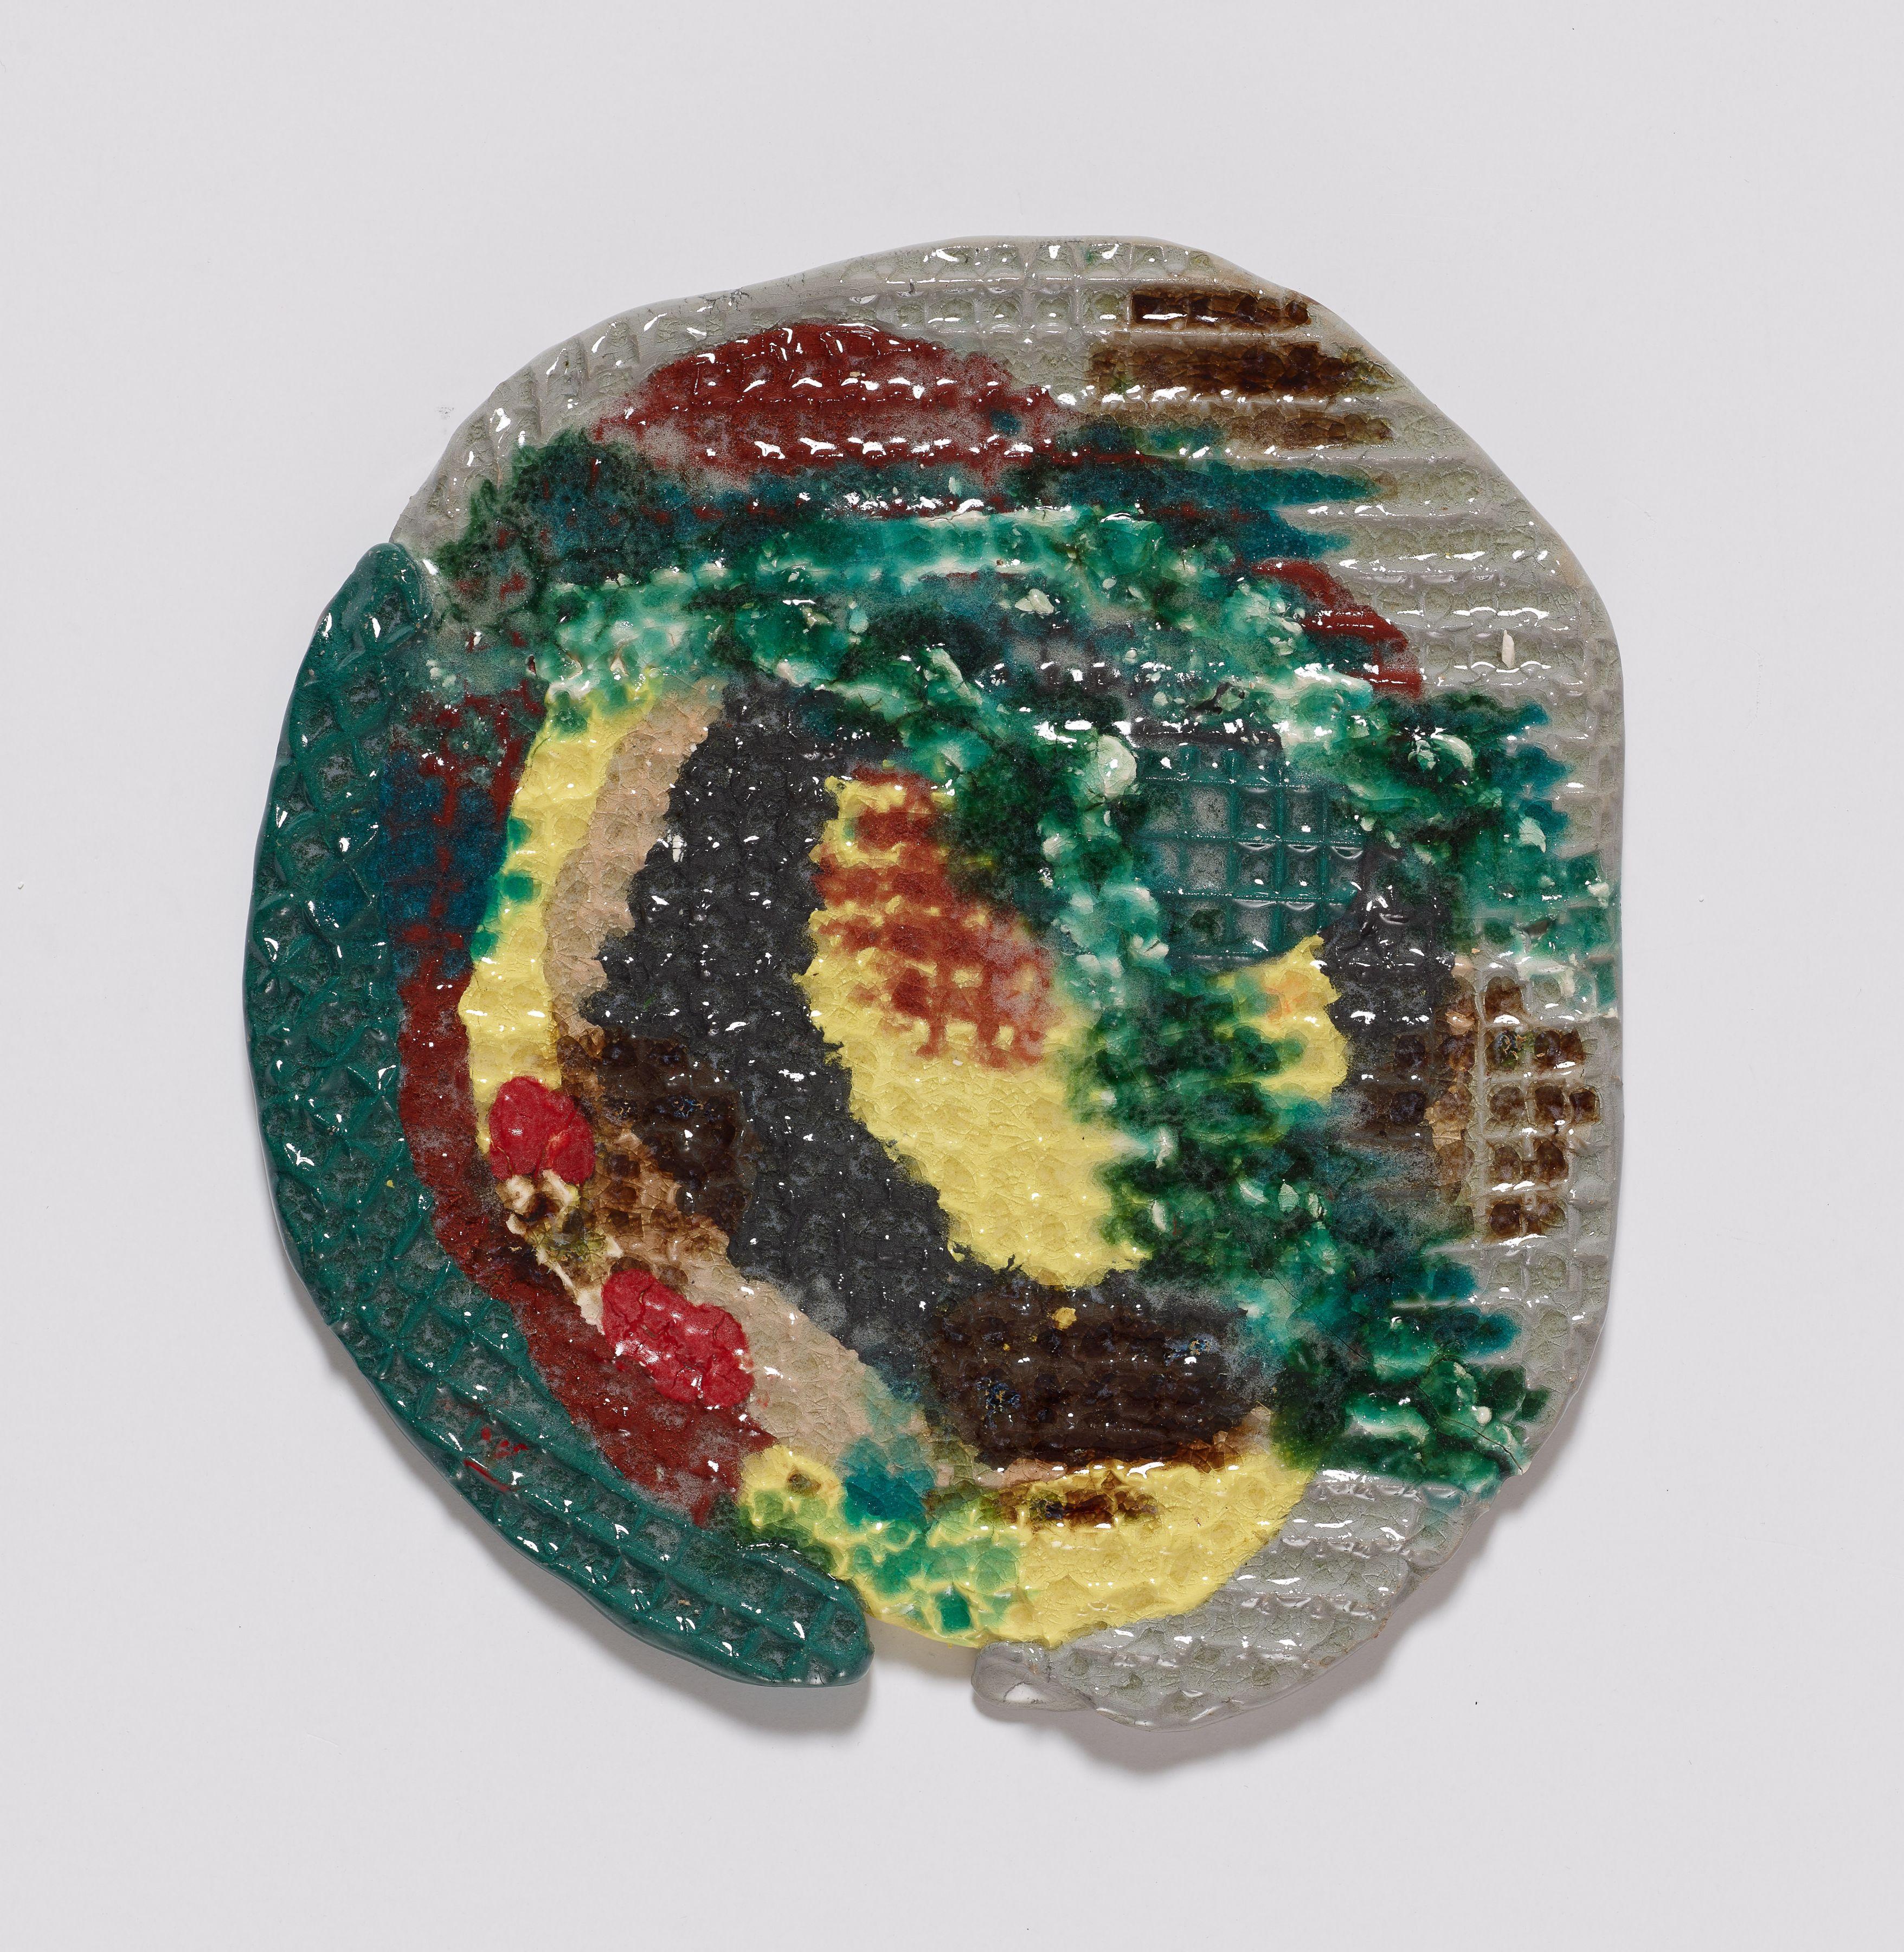 Morris, 2015, Colored porcelain and glaze